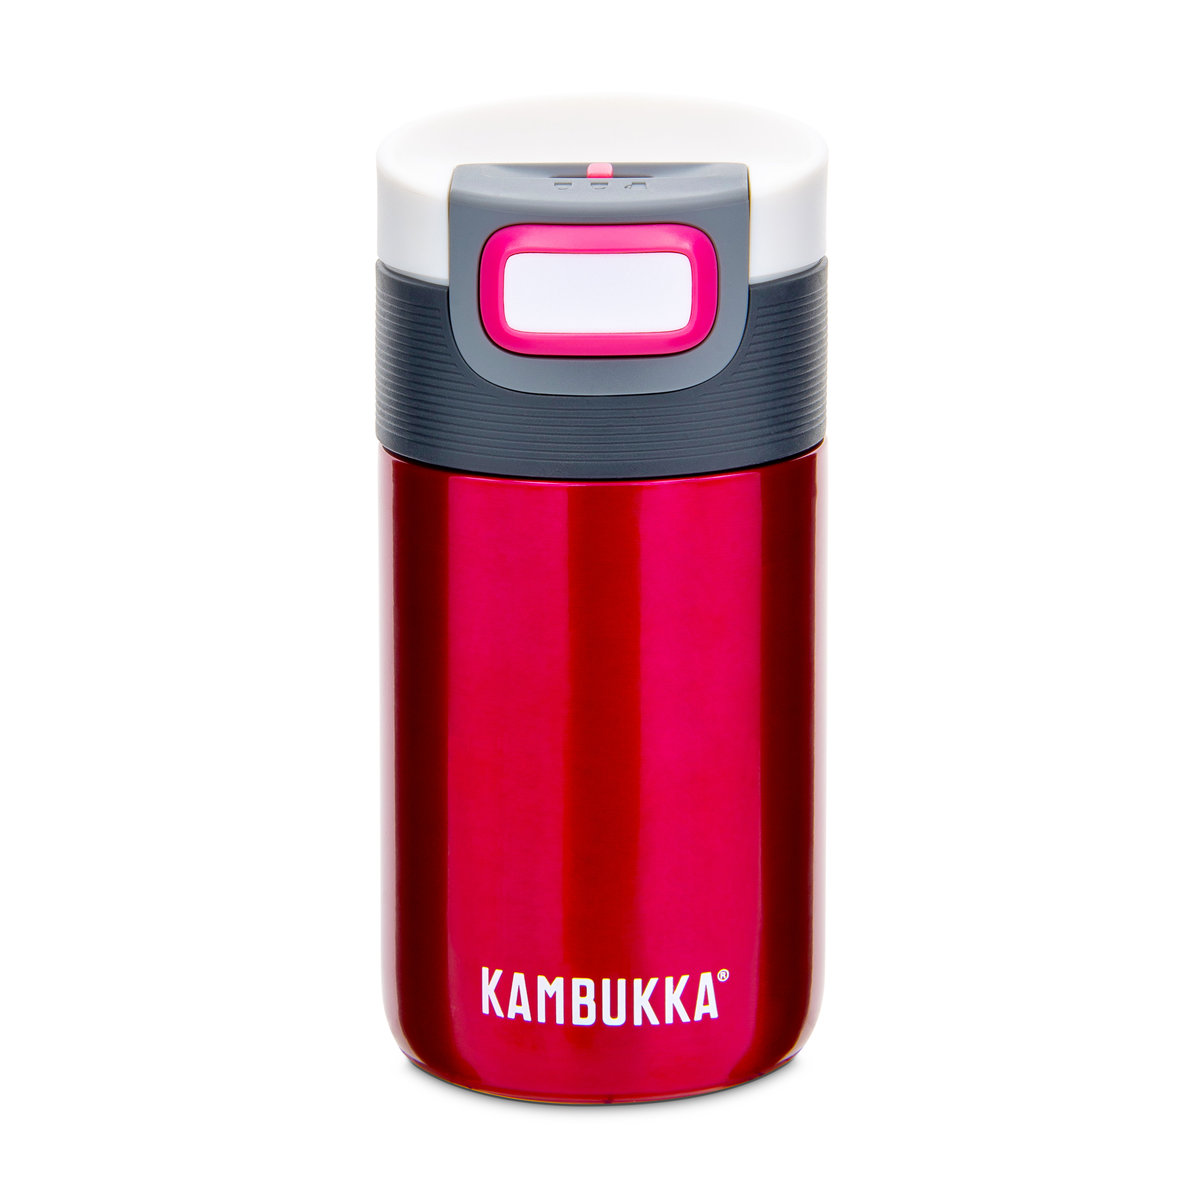 Kambukka 艾娜保溫杯 (不銹鋼) 10oz (300ml) - 紅莓色